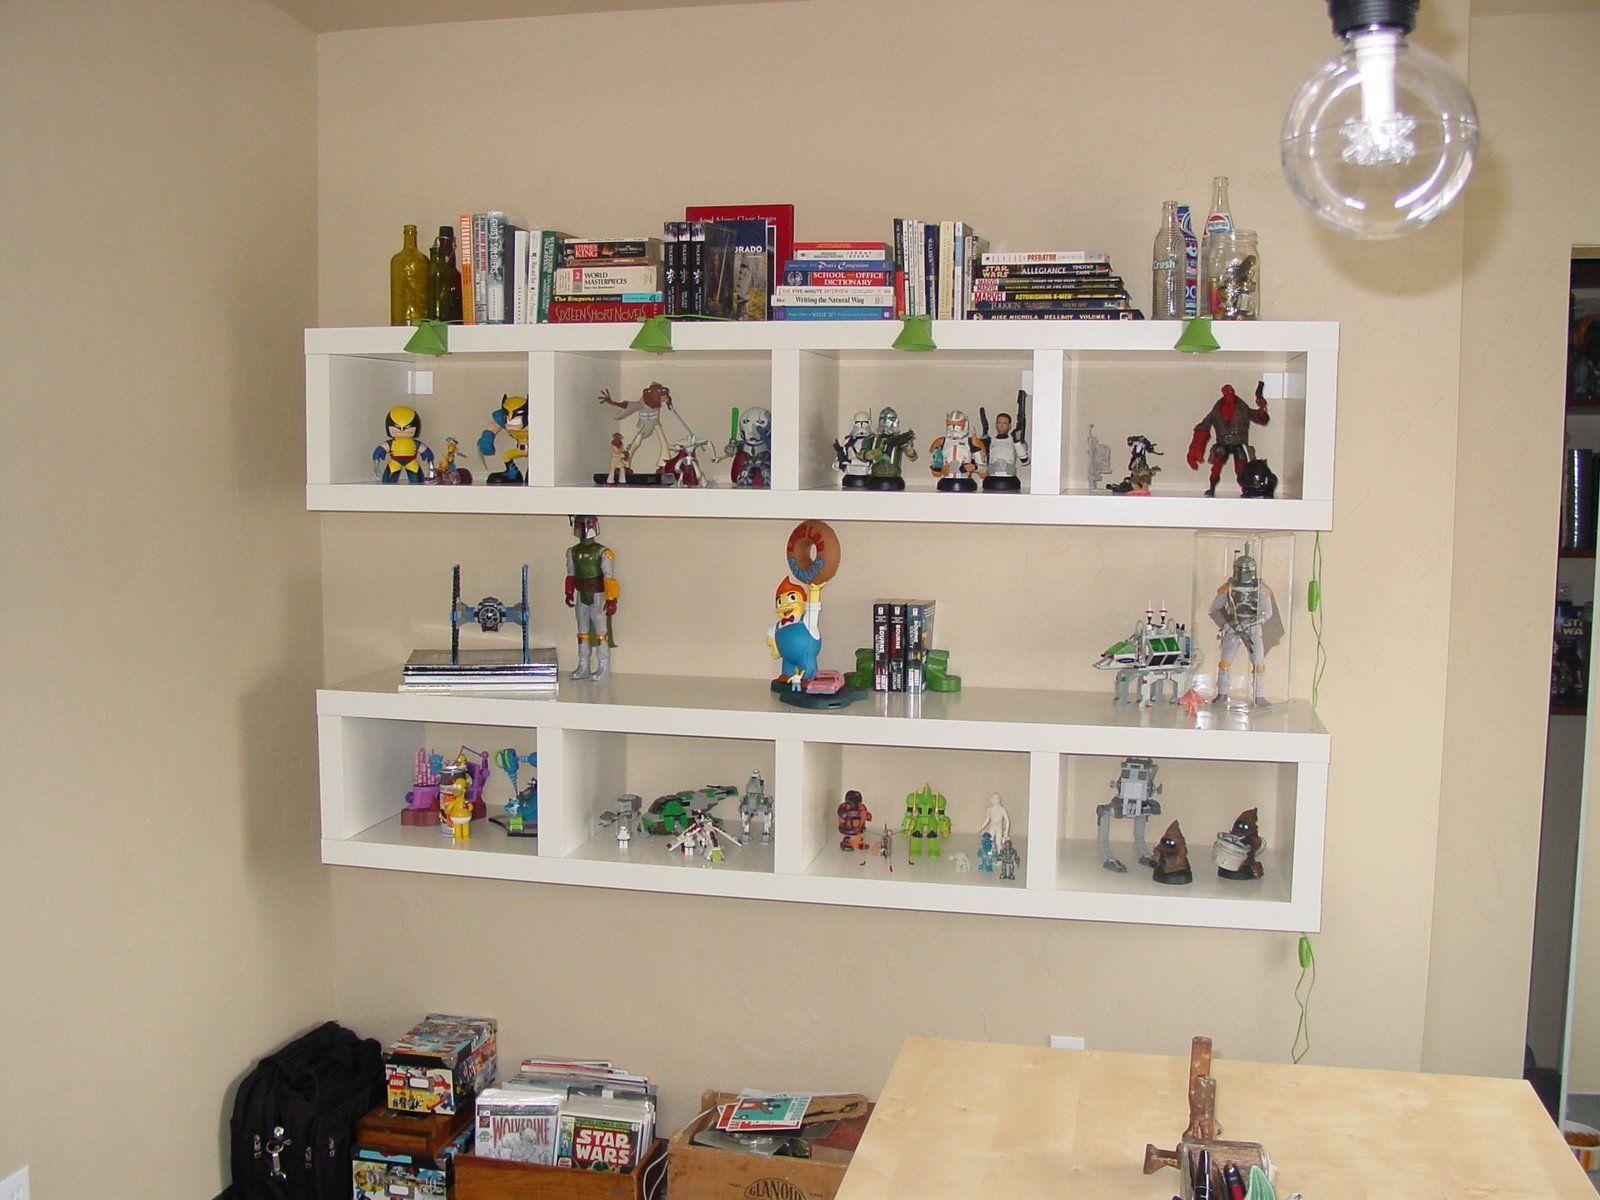 Amusing Colorful Wooden Floating Ikea Spice Rack Bookshelf